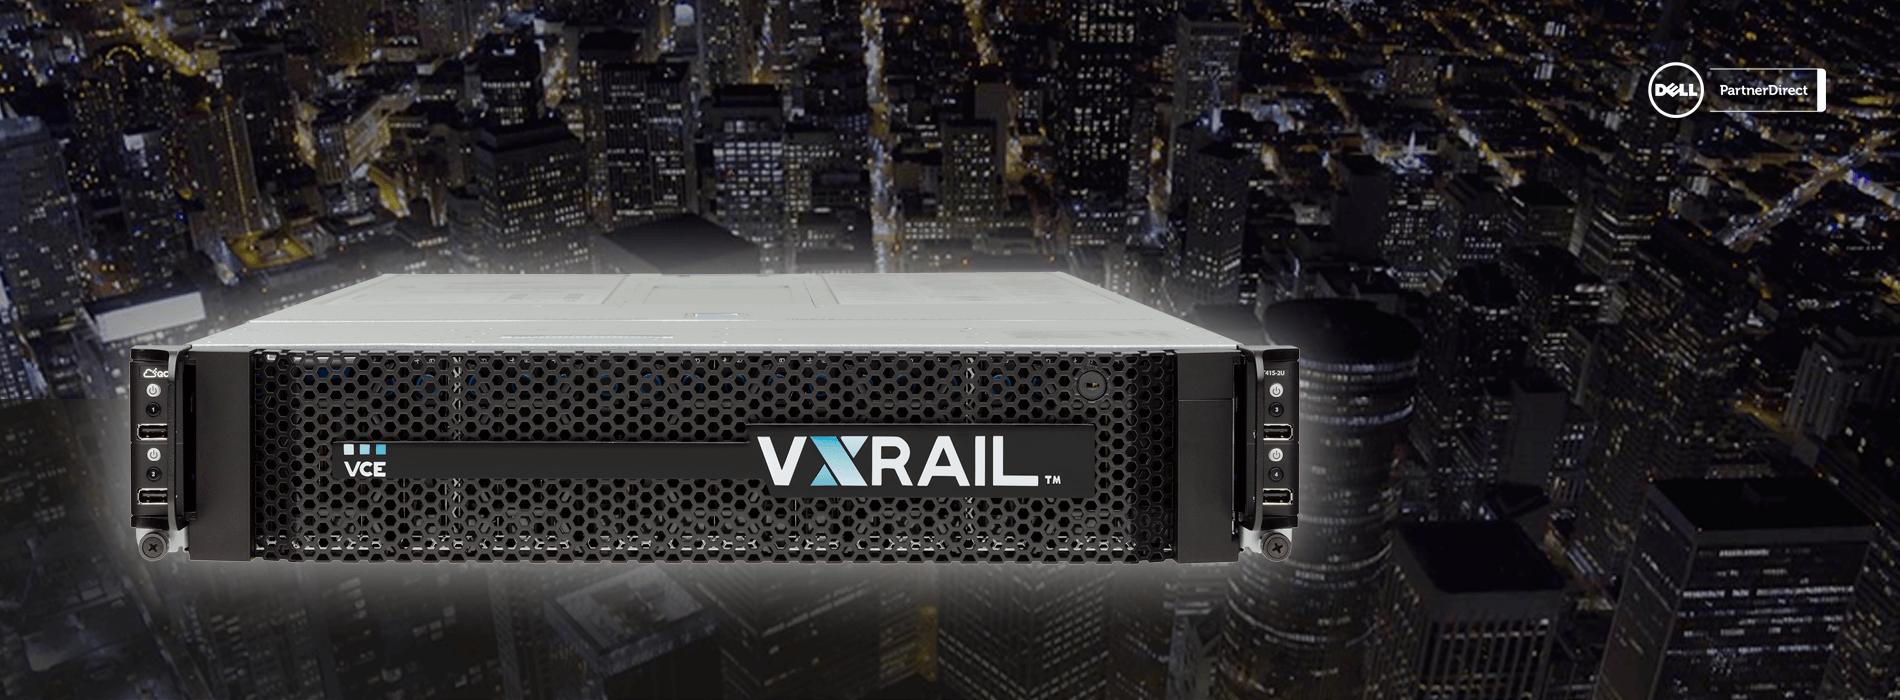 VCE VXRail · Soluciones de hiperconvergencia de Dell - ENETIC